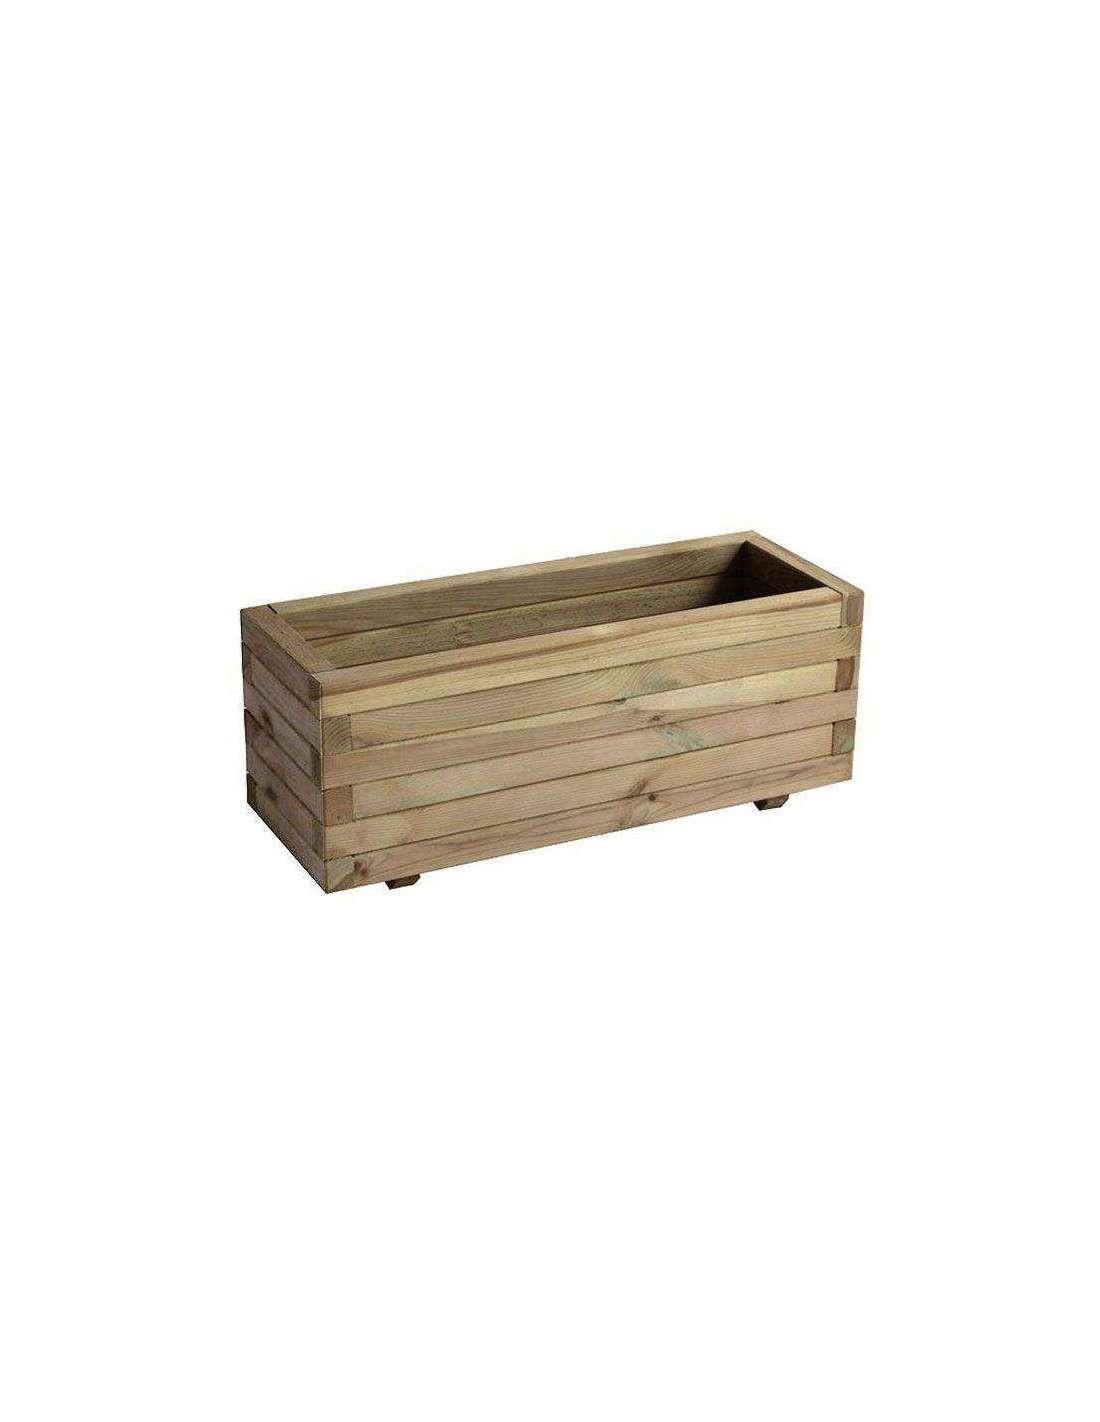 Jardinera rectangular madera fsc 60x60x30cm por 35 en cocopot for Jardineras verticales de madera